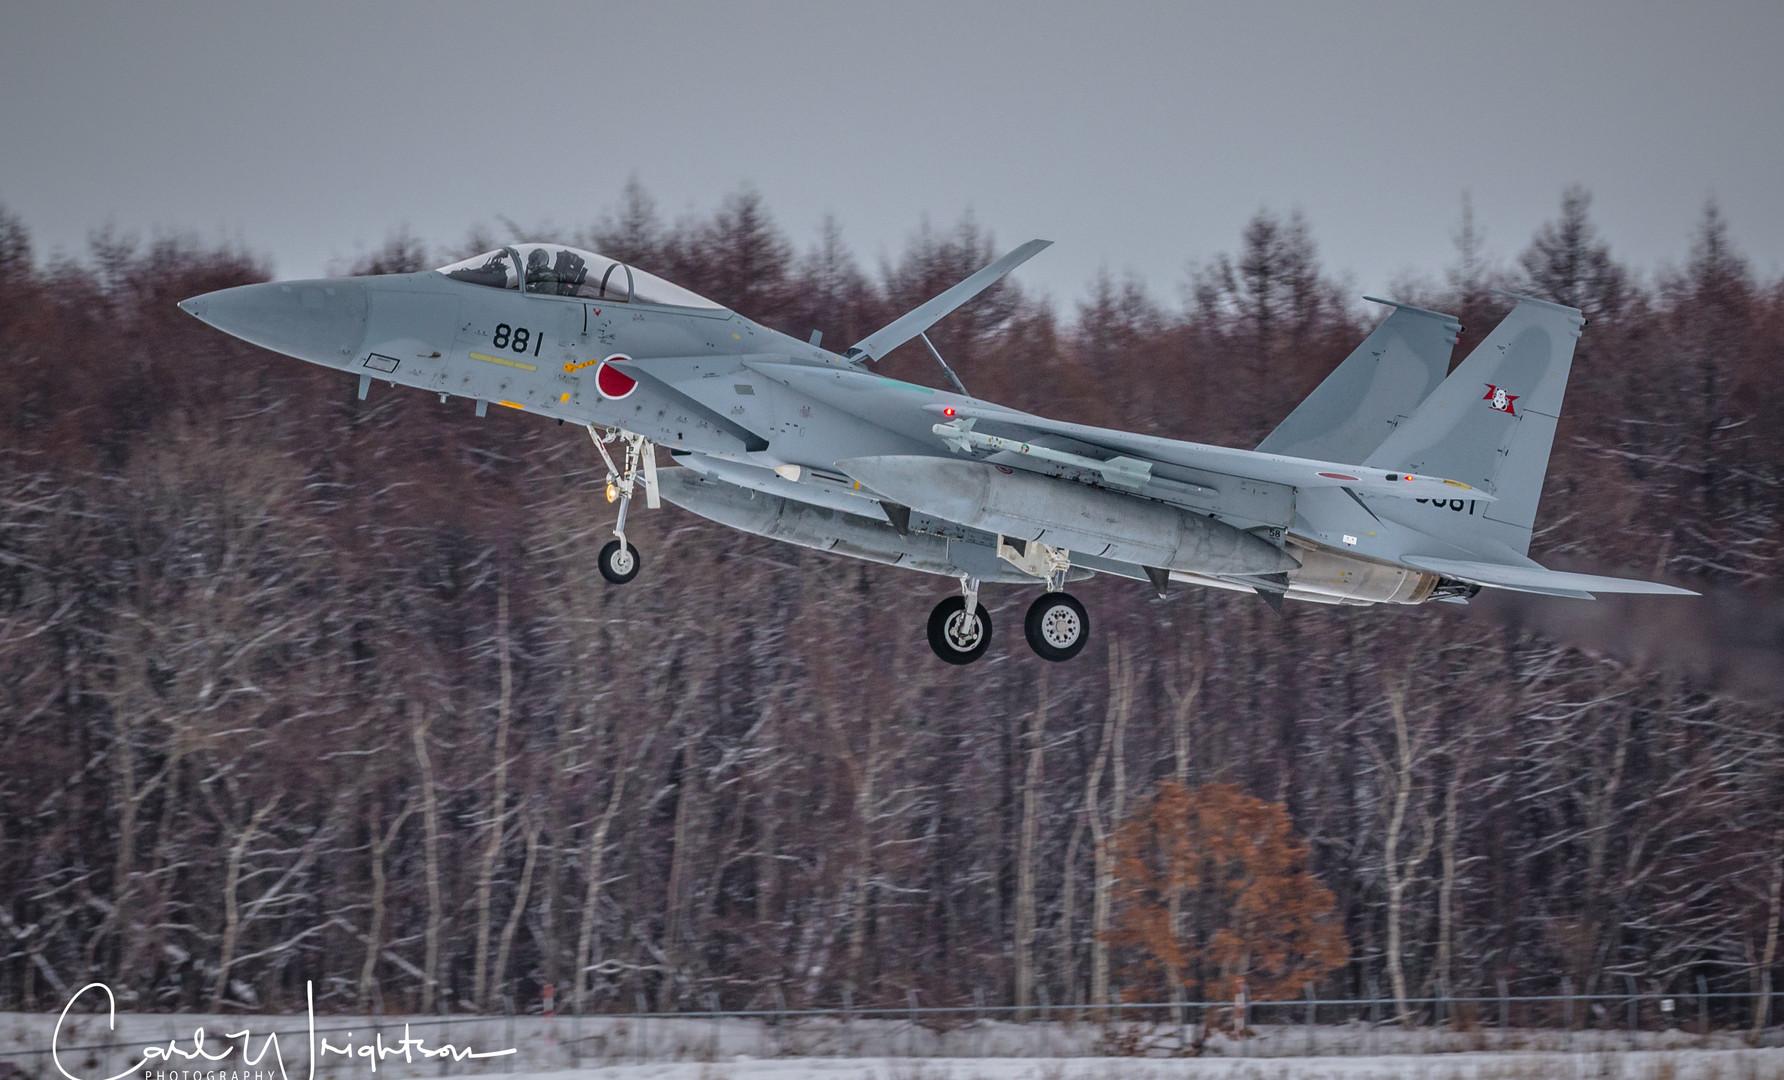 Chitose Air Base, Hokkaido, Japan